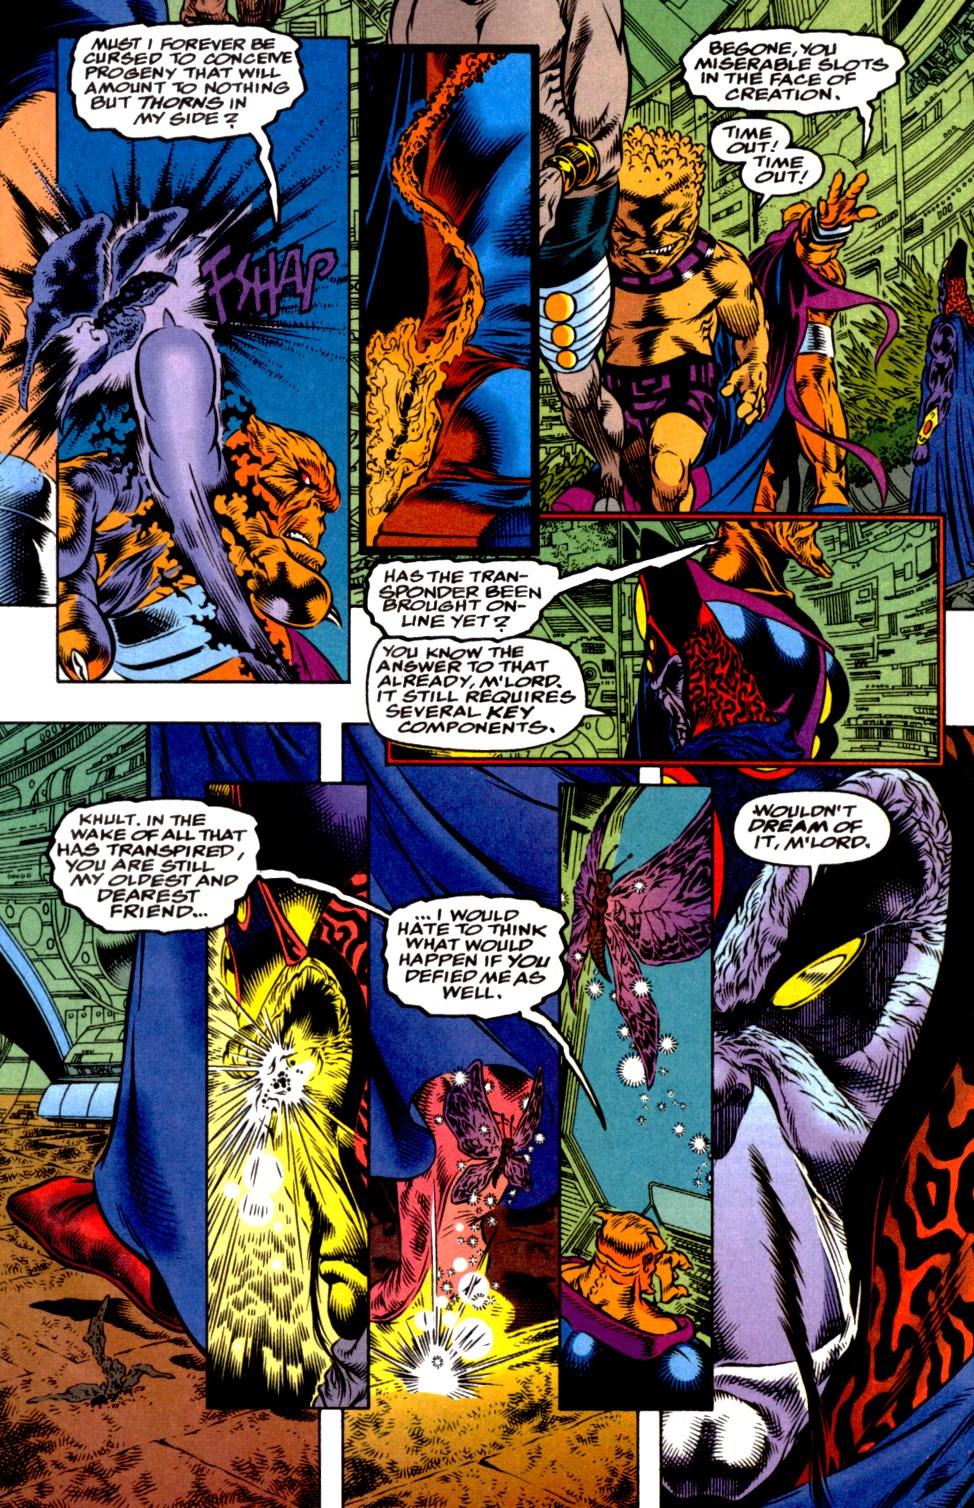 Read online Blackwulf comic -  Issue #2 - 9